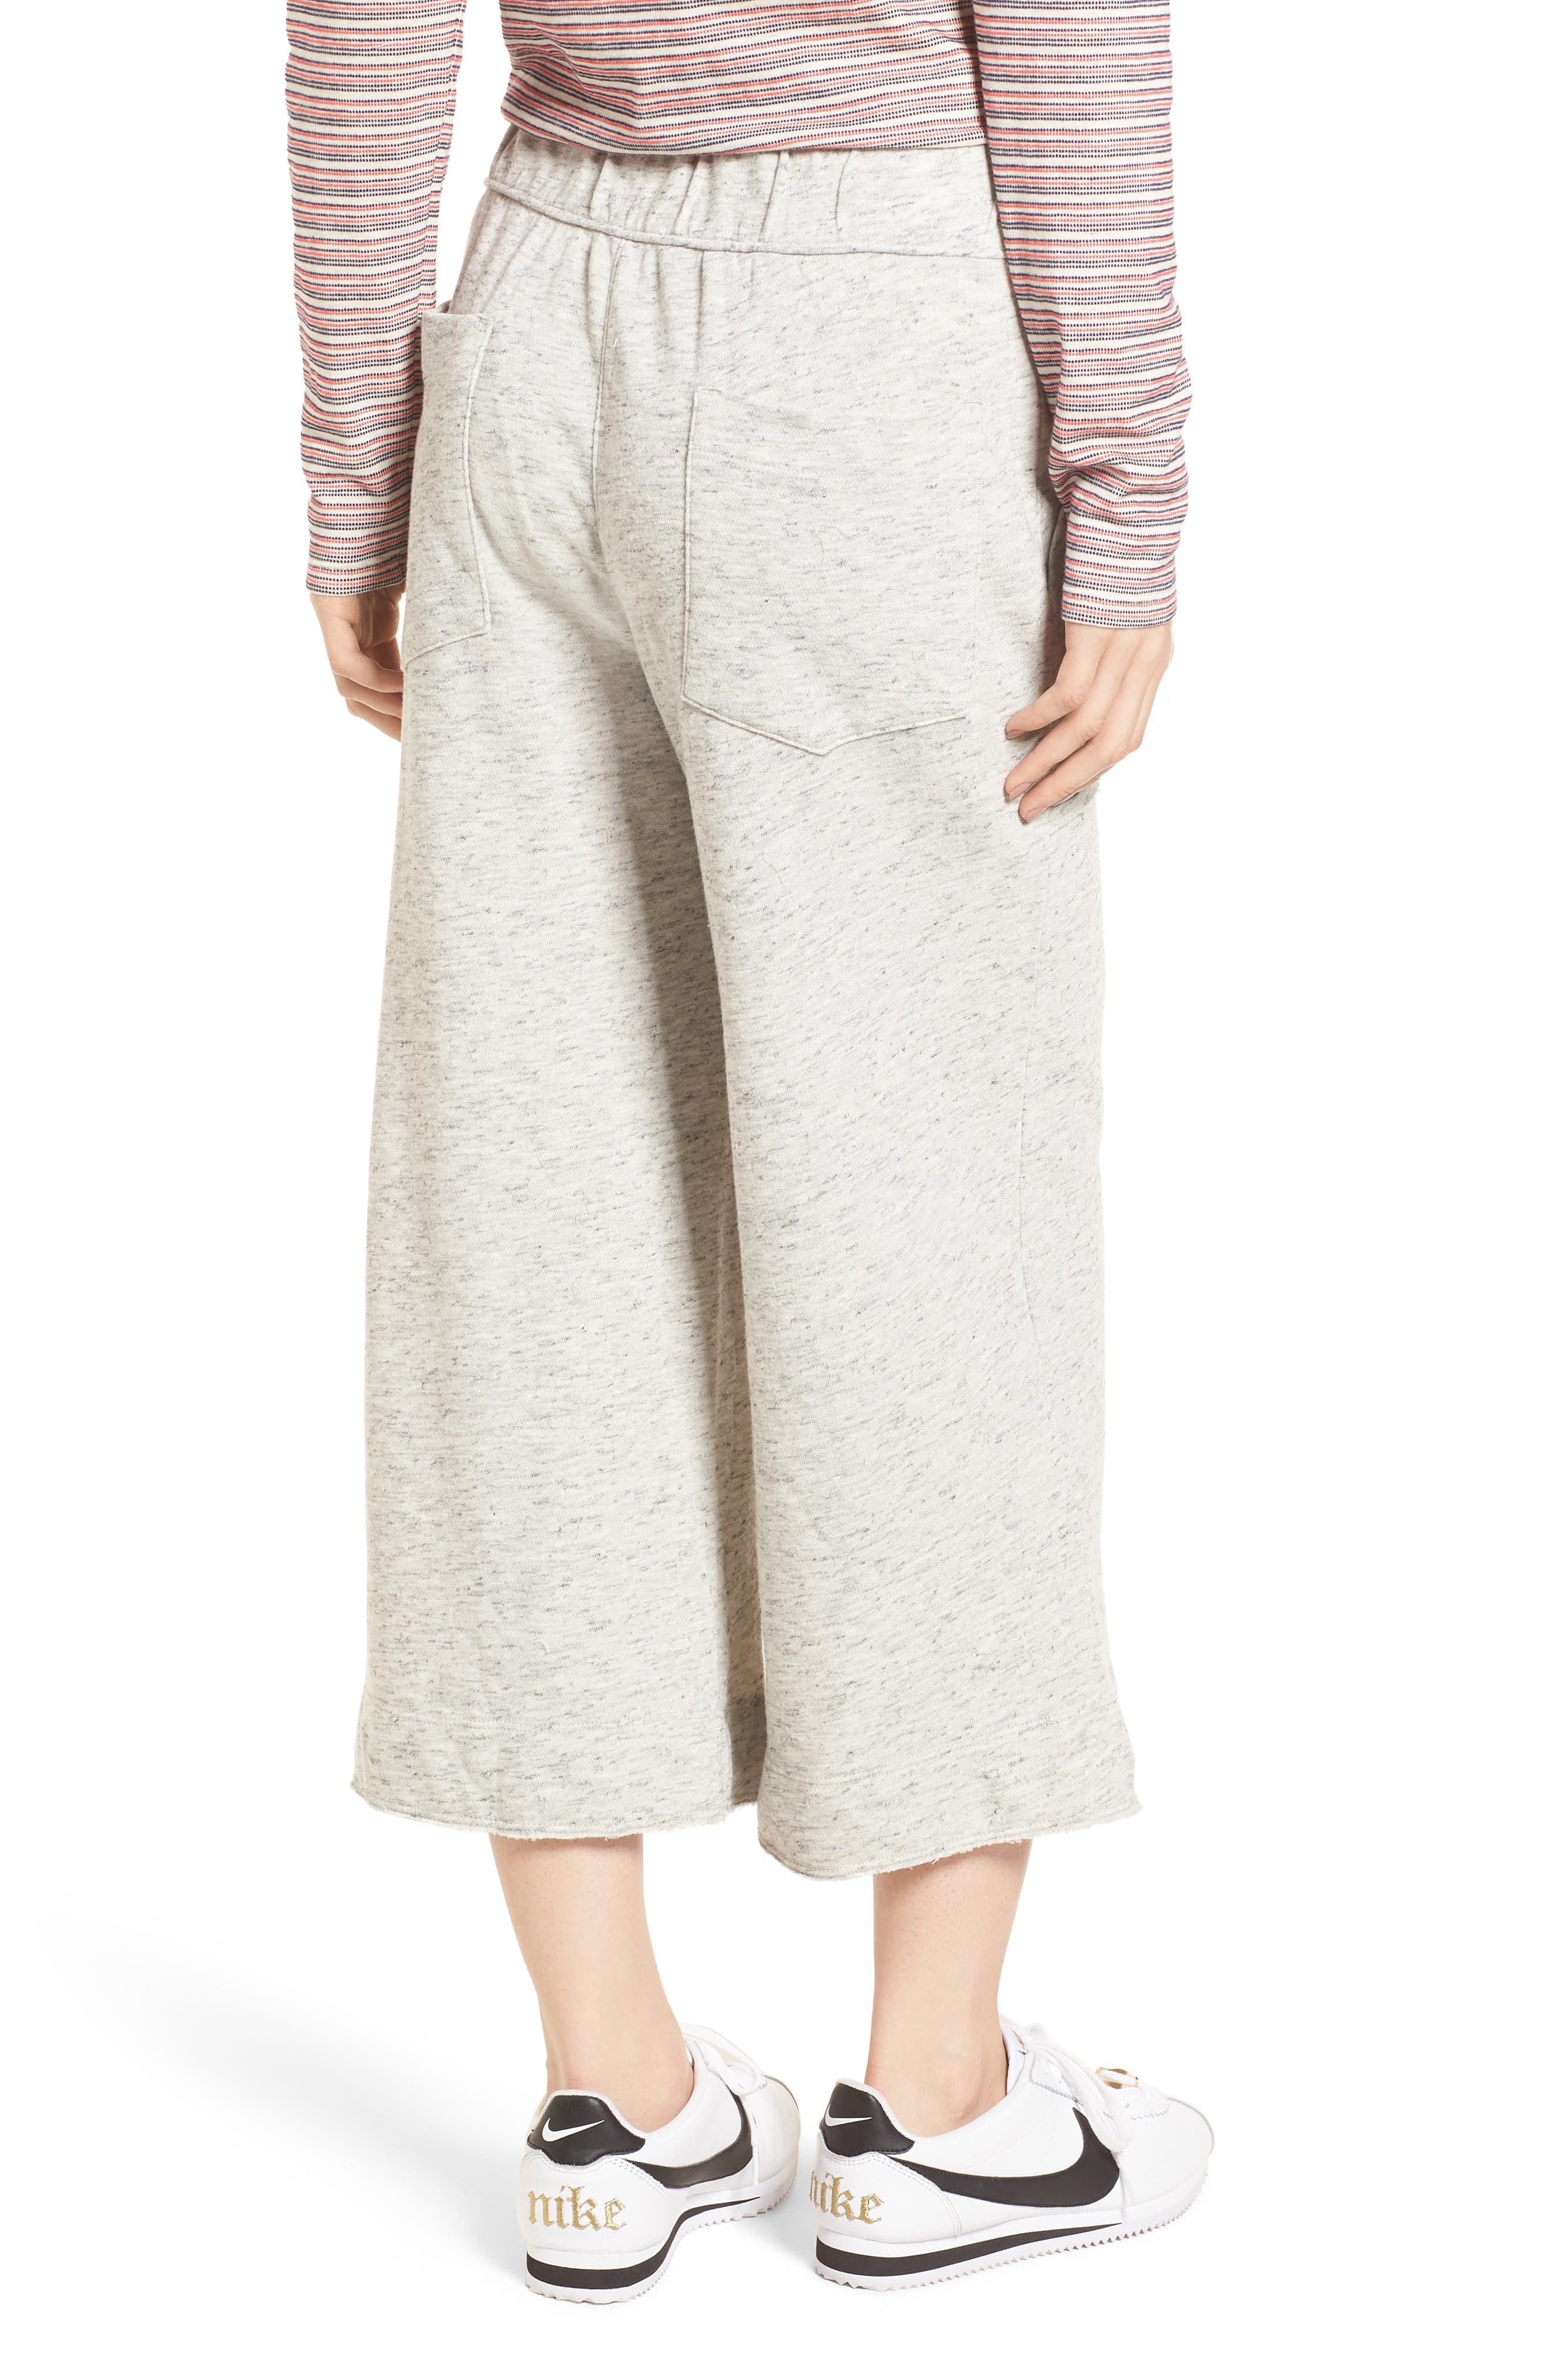 Sidelight Culotte Sweatpants,                             Alternate thumbnail 2, color,                             Grey